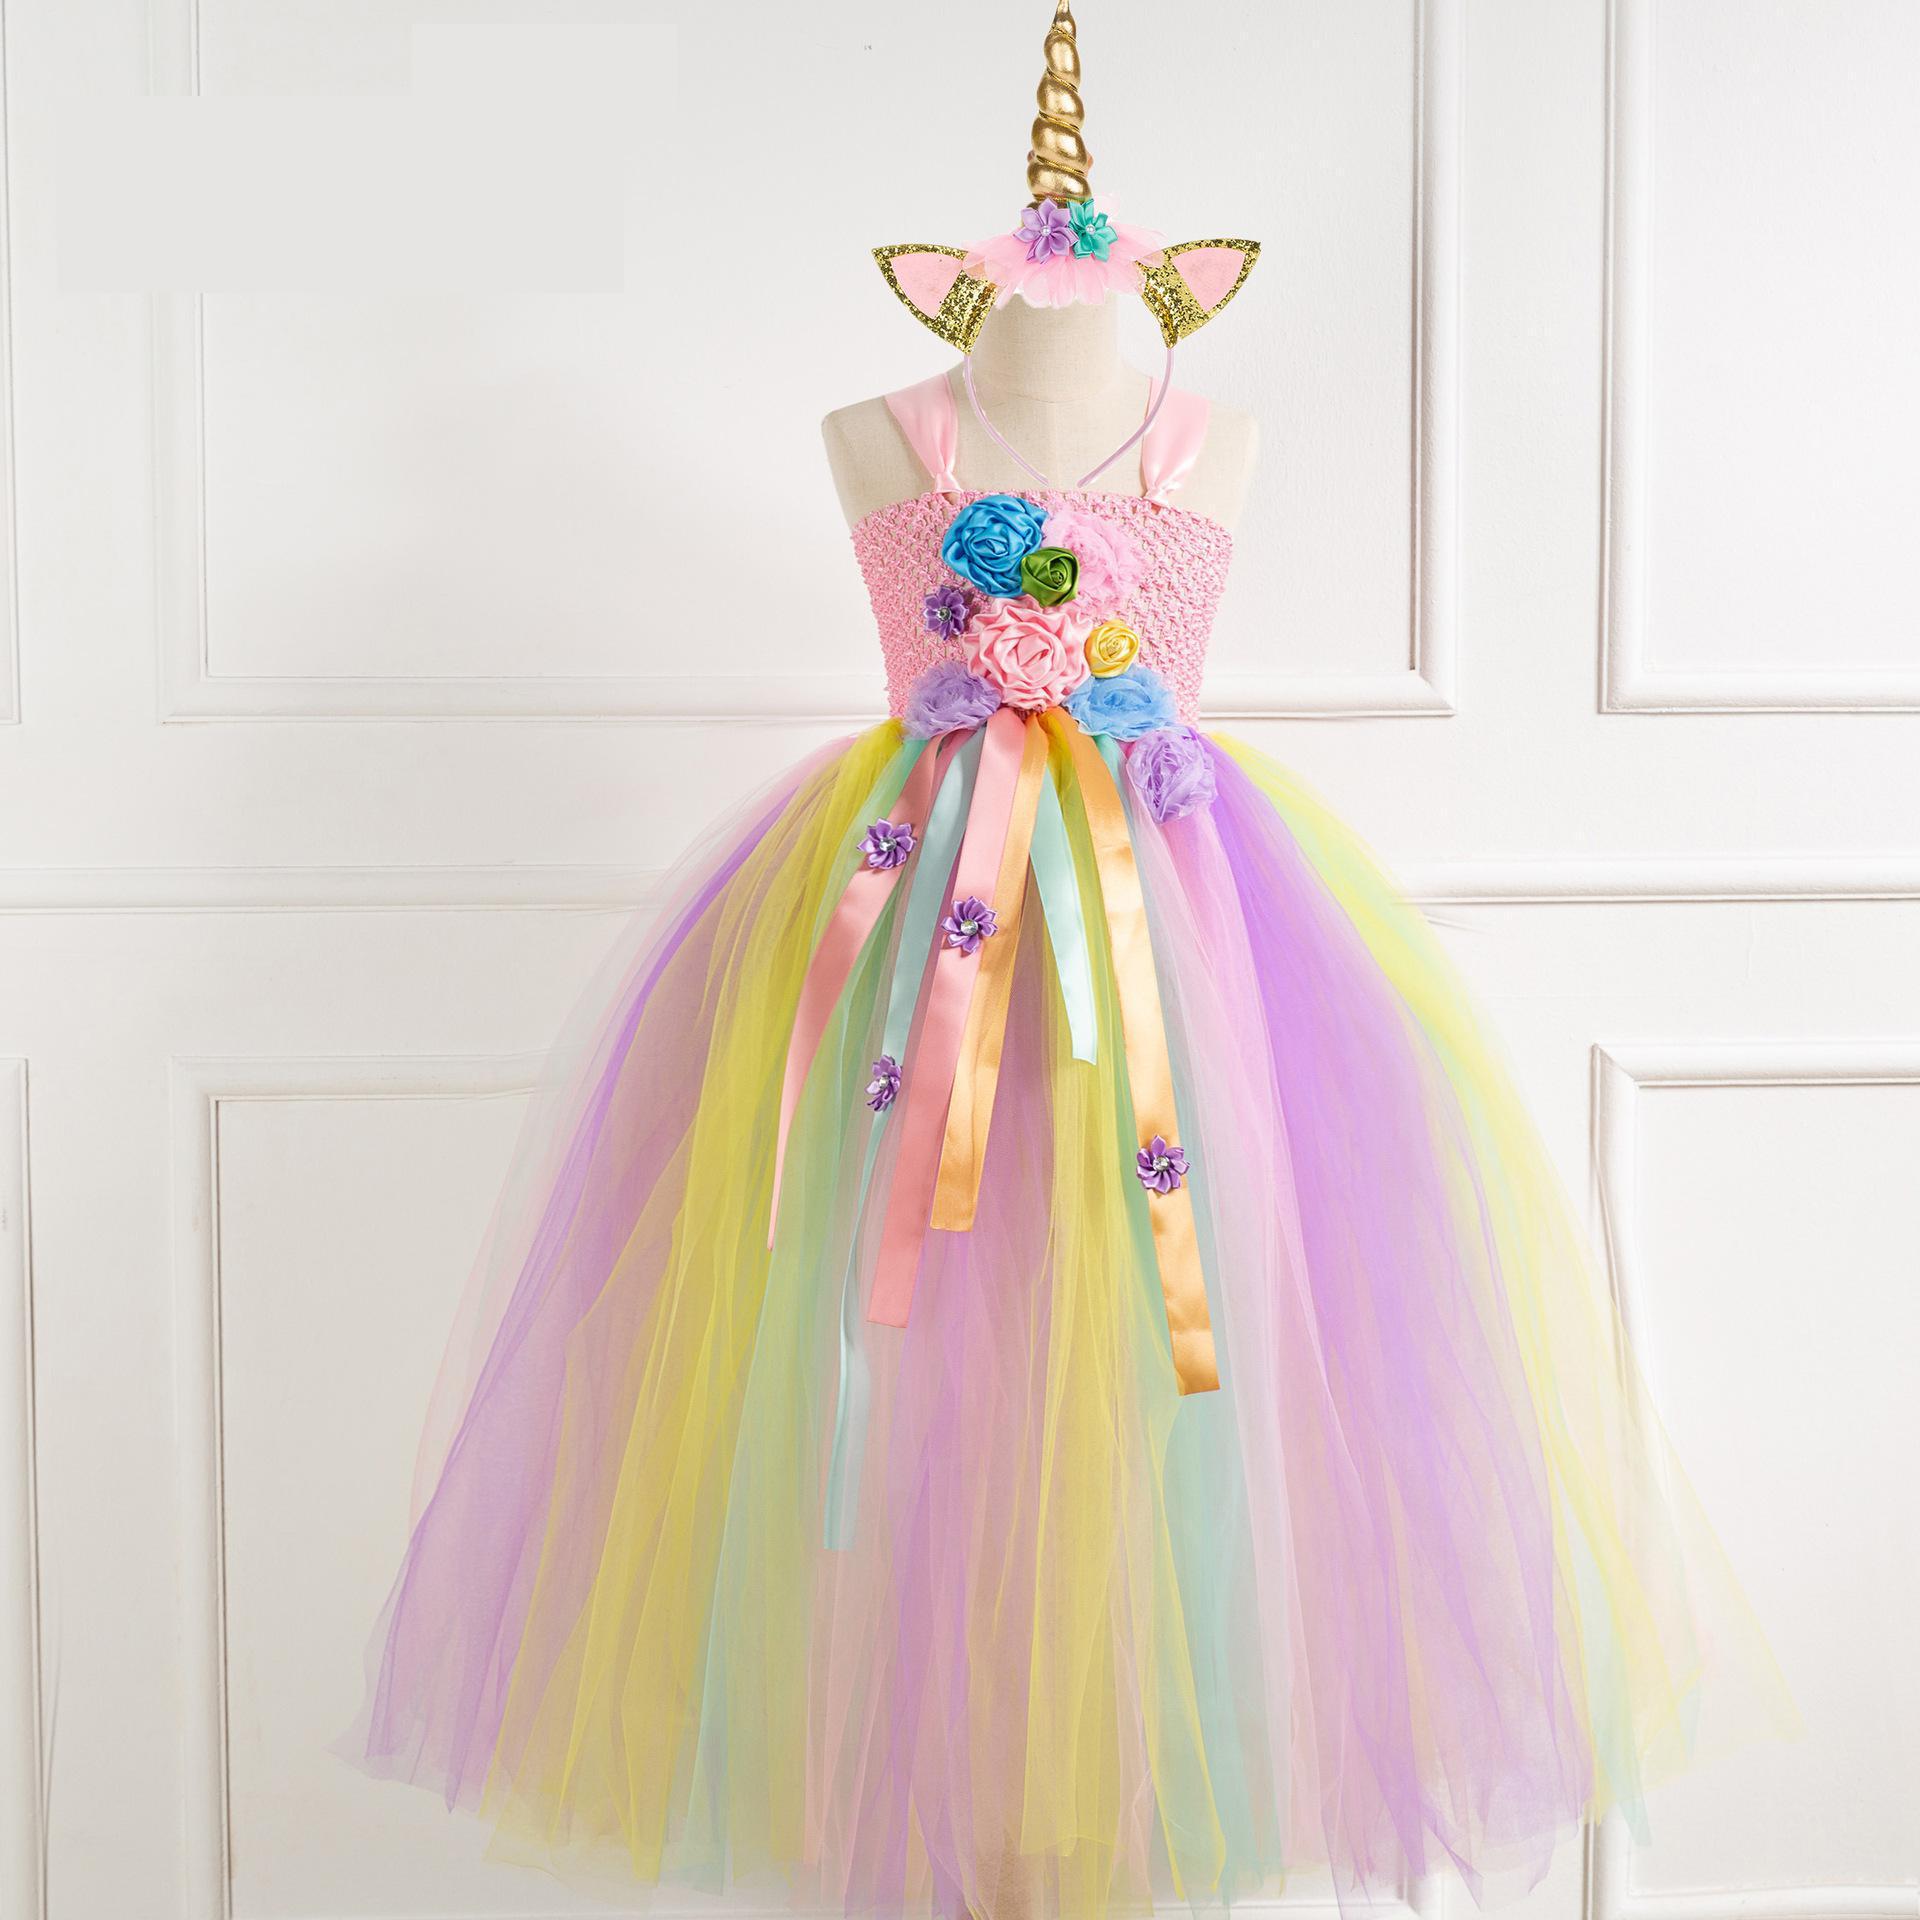 Rainbow Girls Unicorn Tutu Dress Kids Flower Birthday Party Dress Girls Fancy Dress For Children Christmas Halloween Costumes